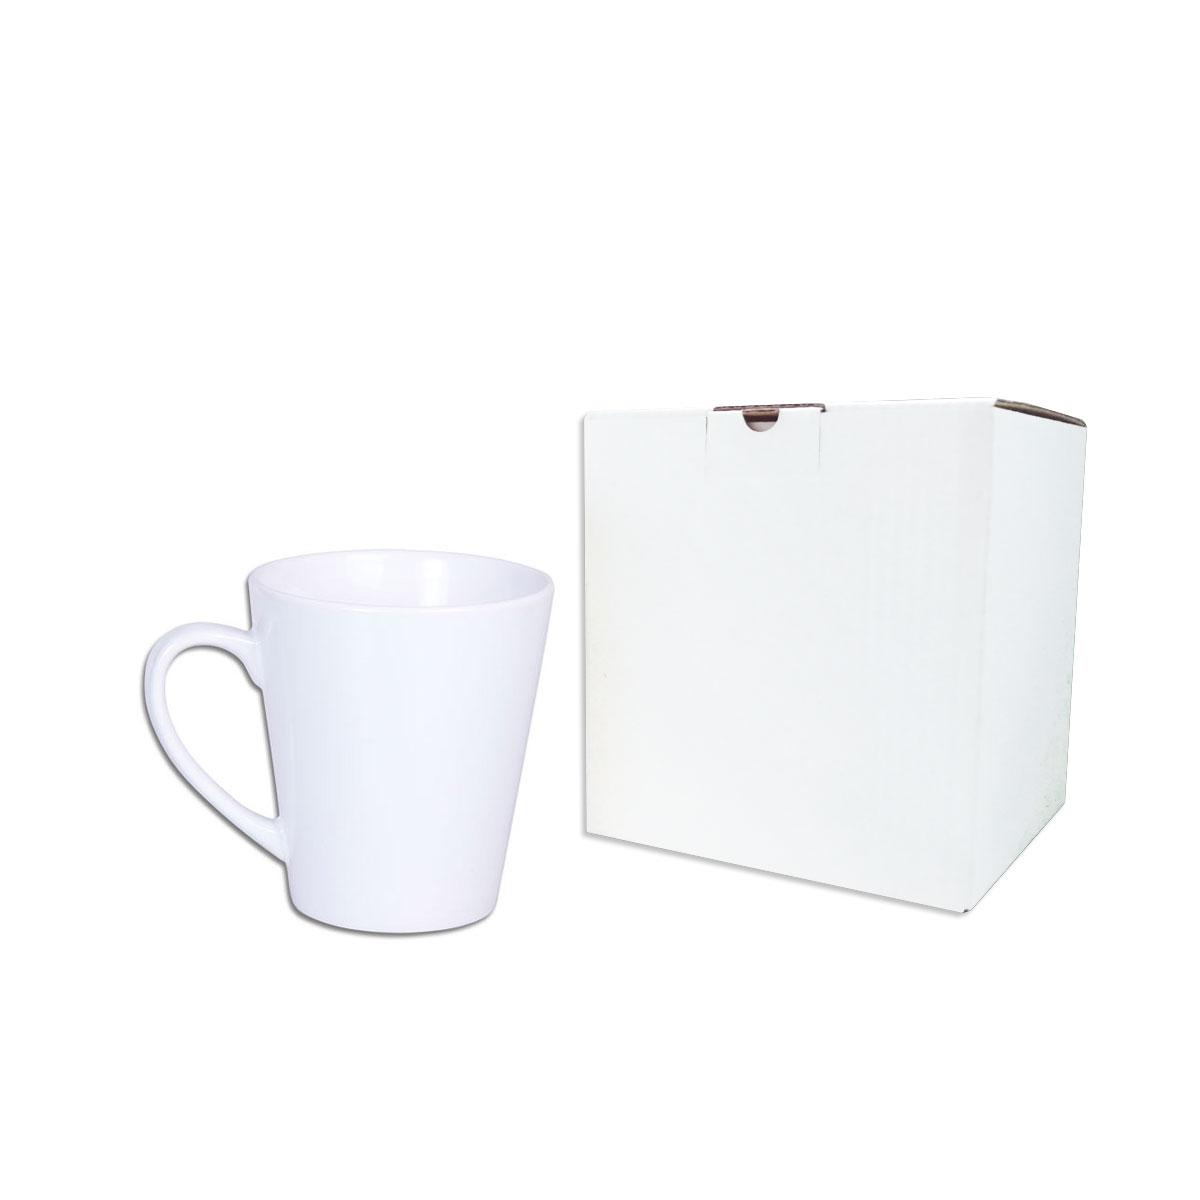 Kartonik na kubek standard i latte